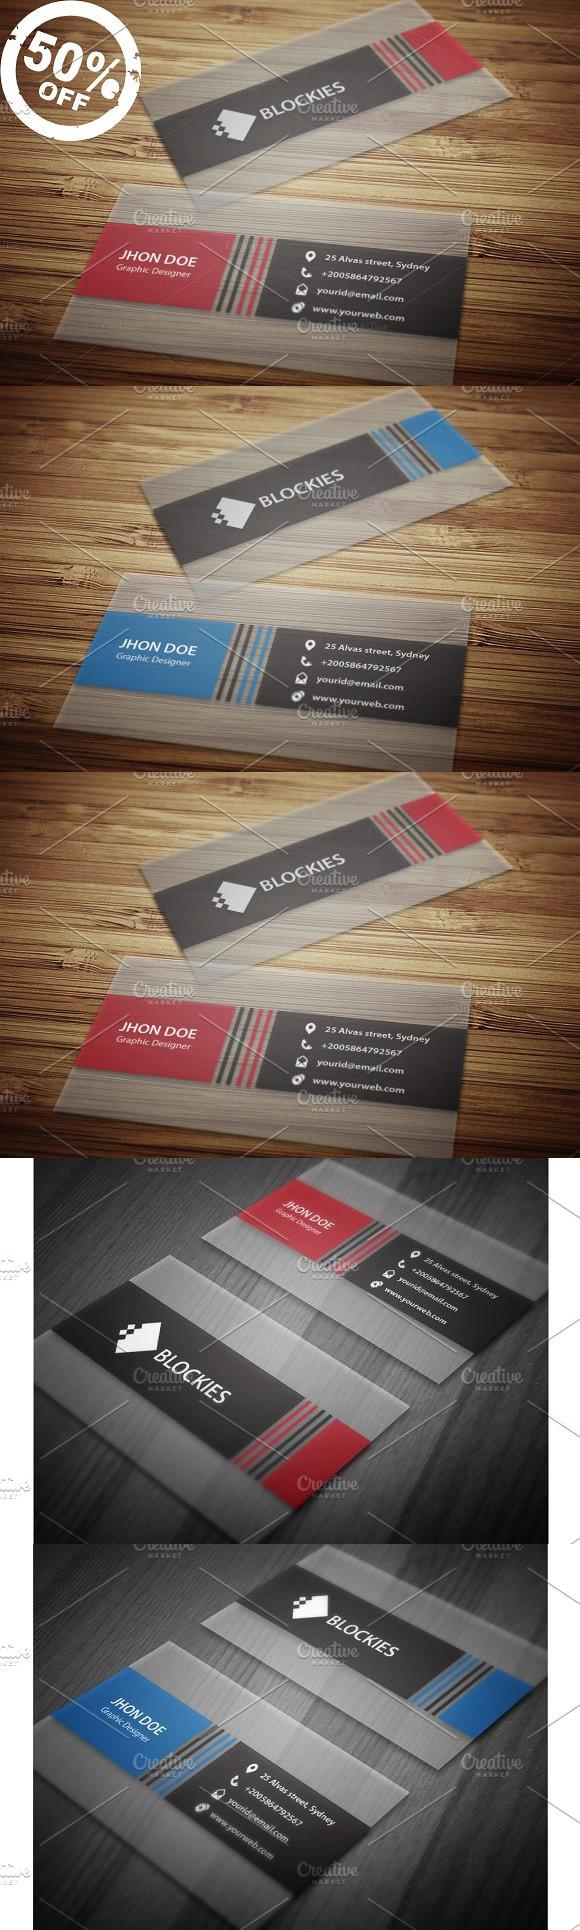 Semi transparent business card creative business card templates semi transparent business card creative business card templates wajeb Gallery